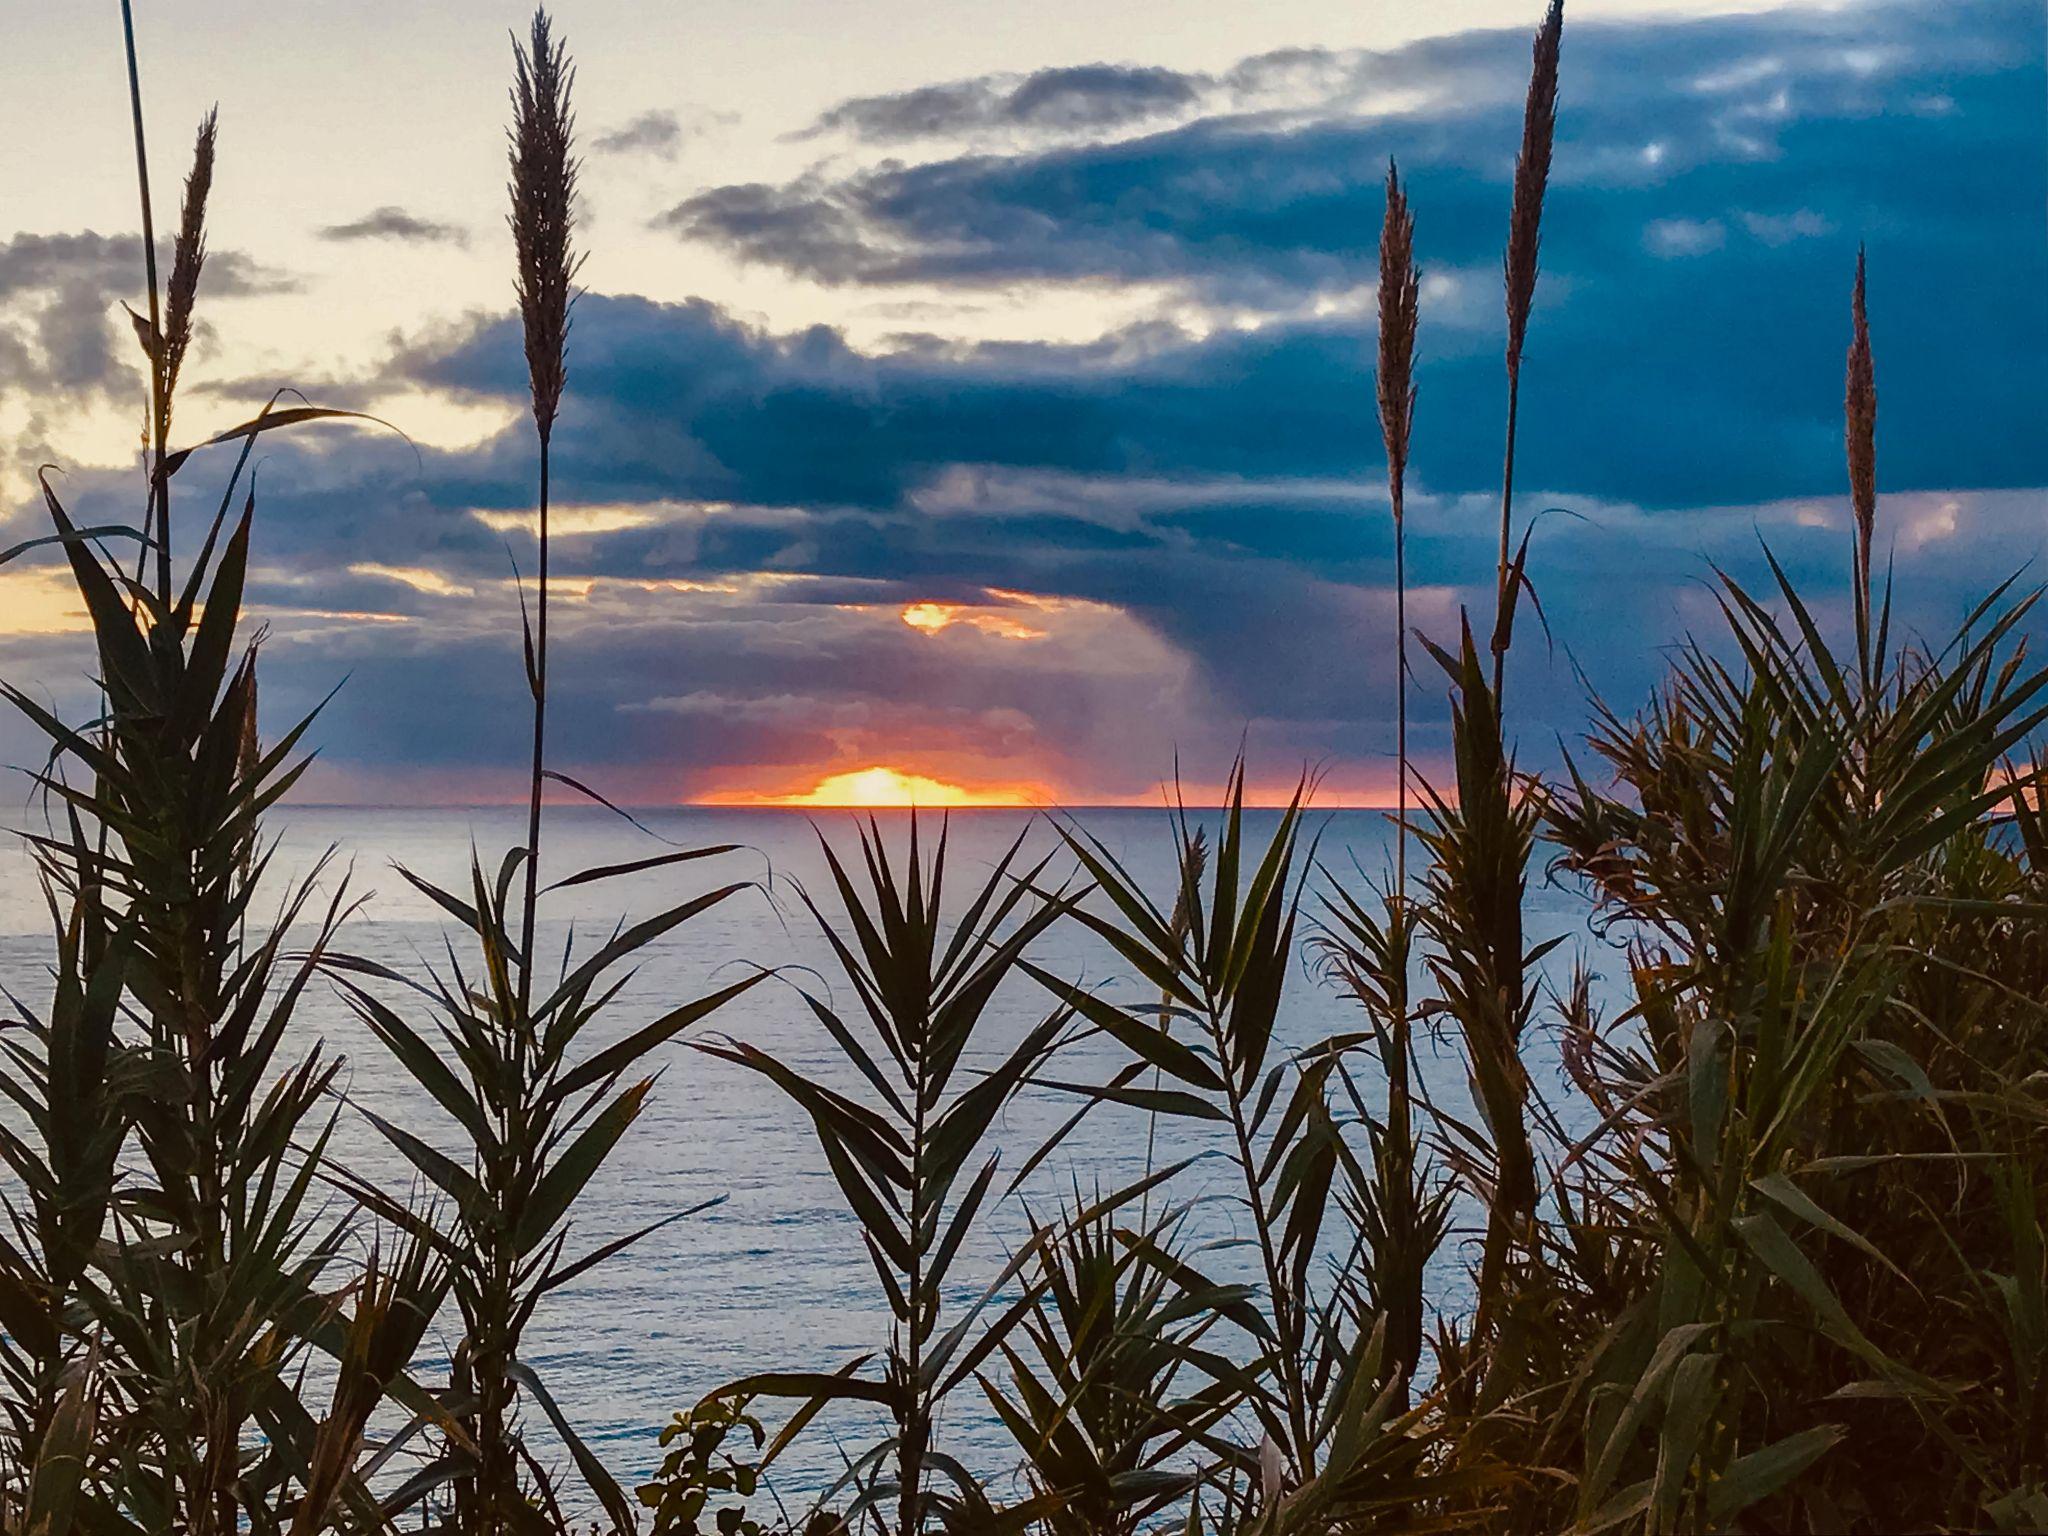 Sunrise Bungan Beach Sydney, Australia